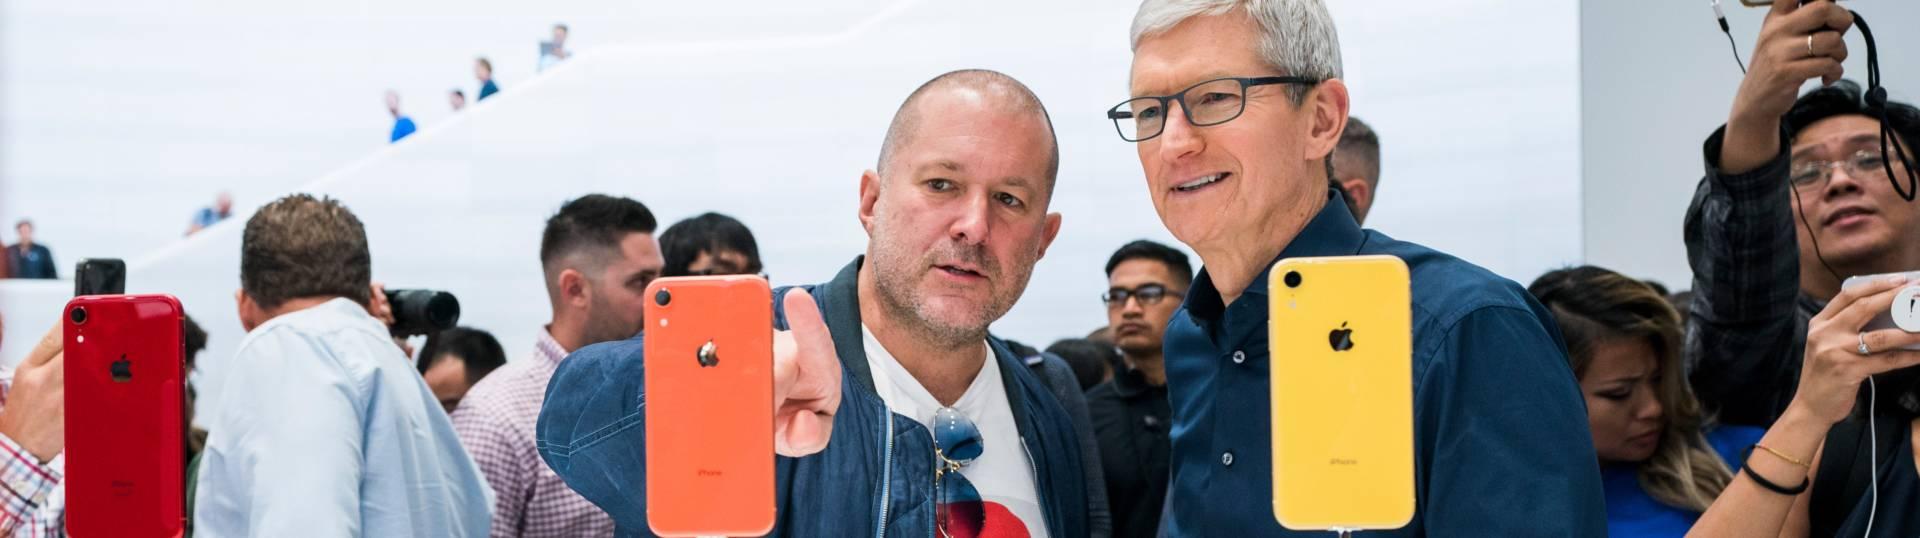 Jony Ive lascia Apple - cover